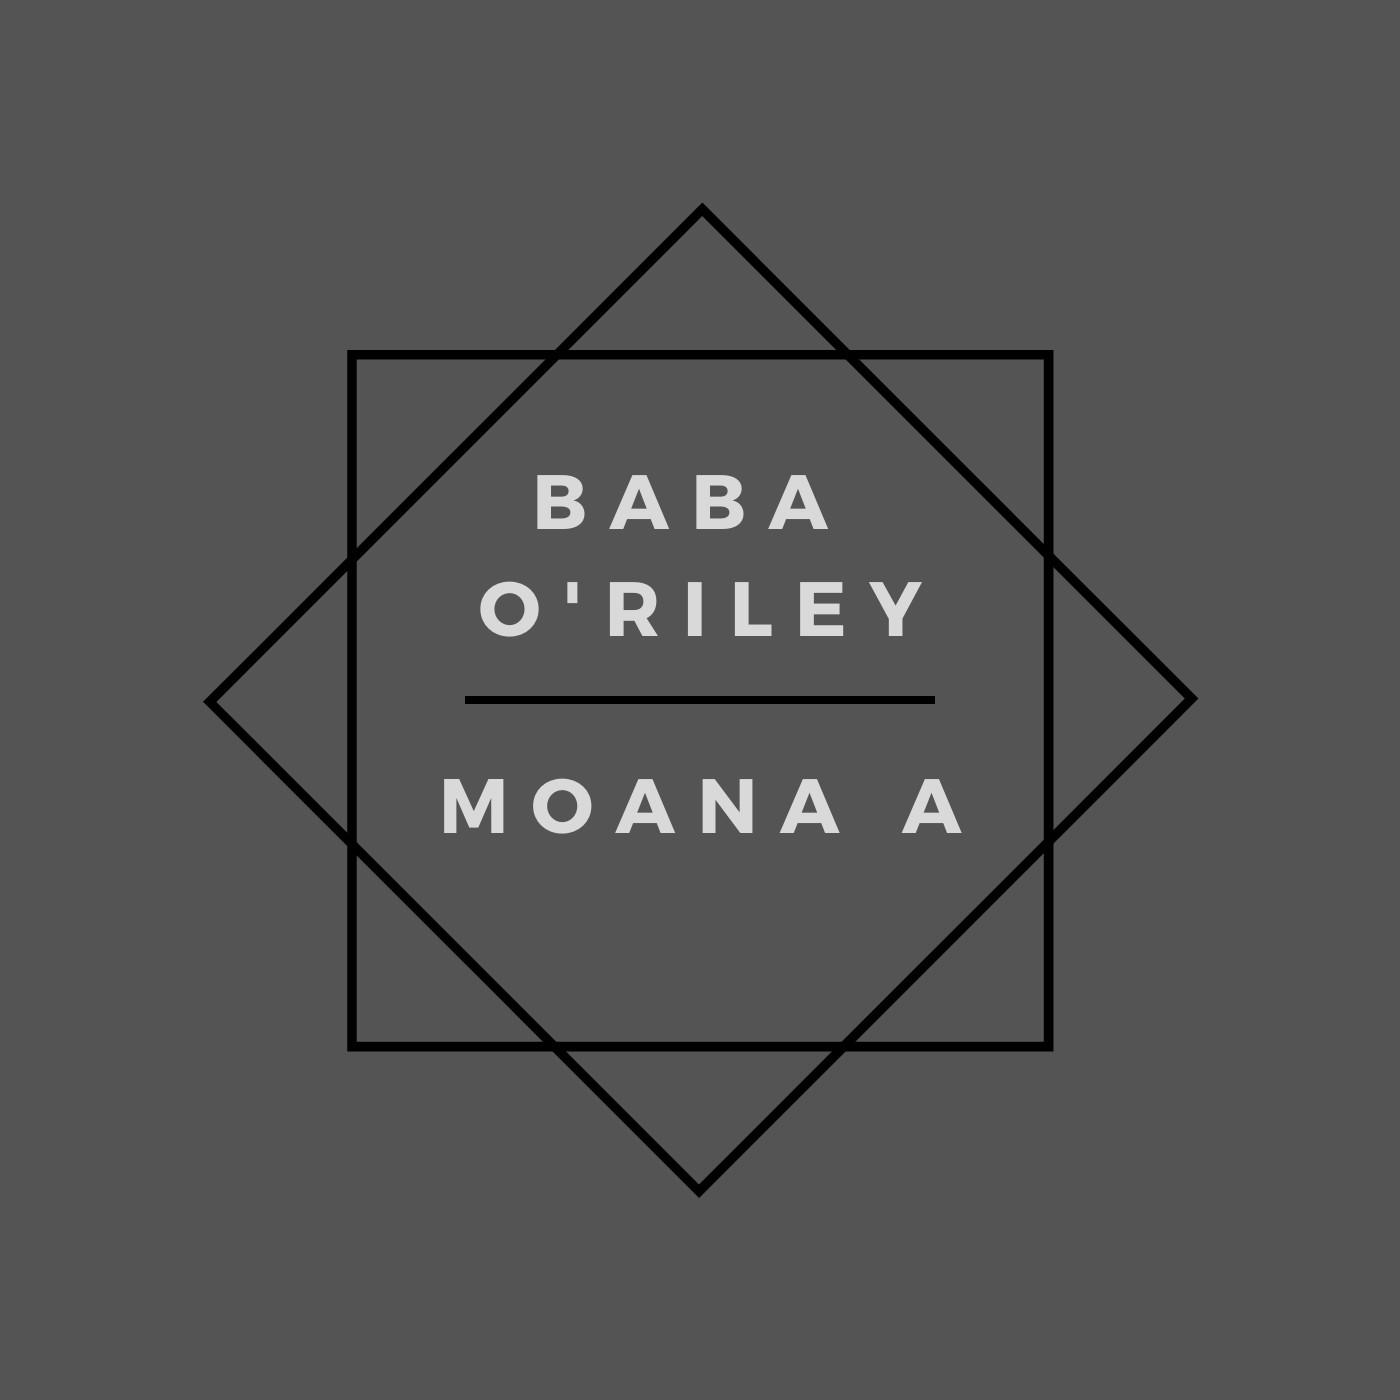 Baba O'Riley (Teenage Wasteland) (The Who Cover)